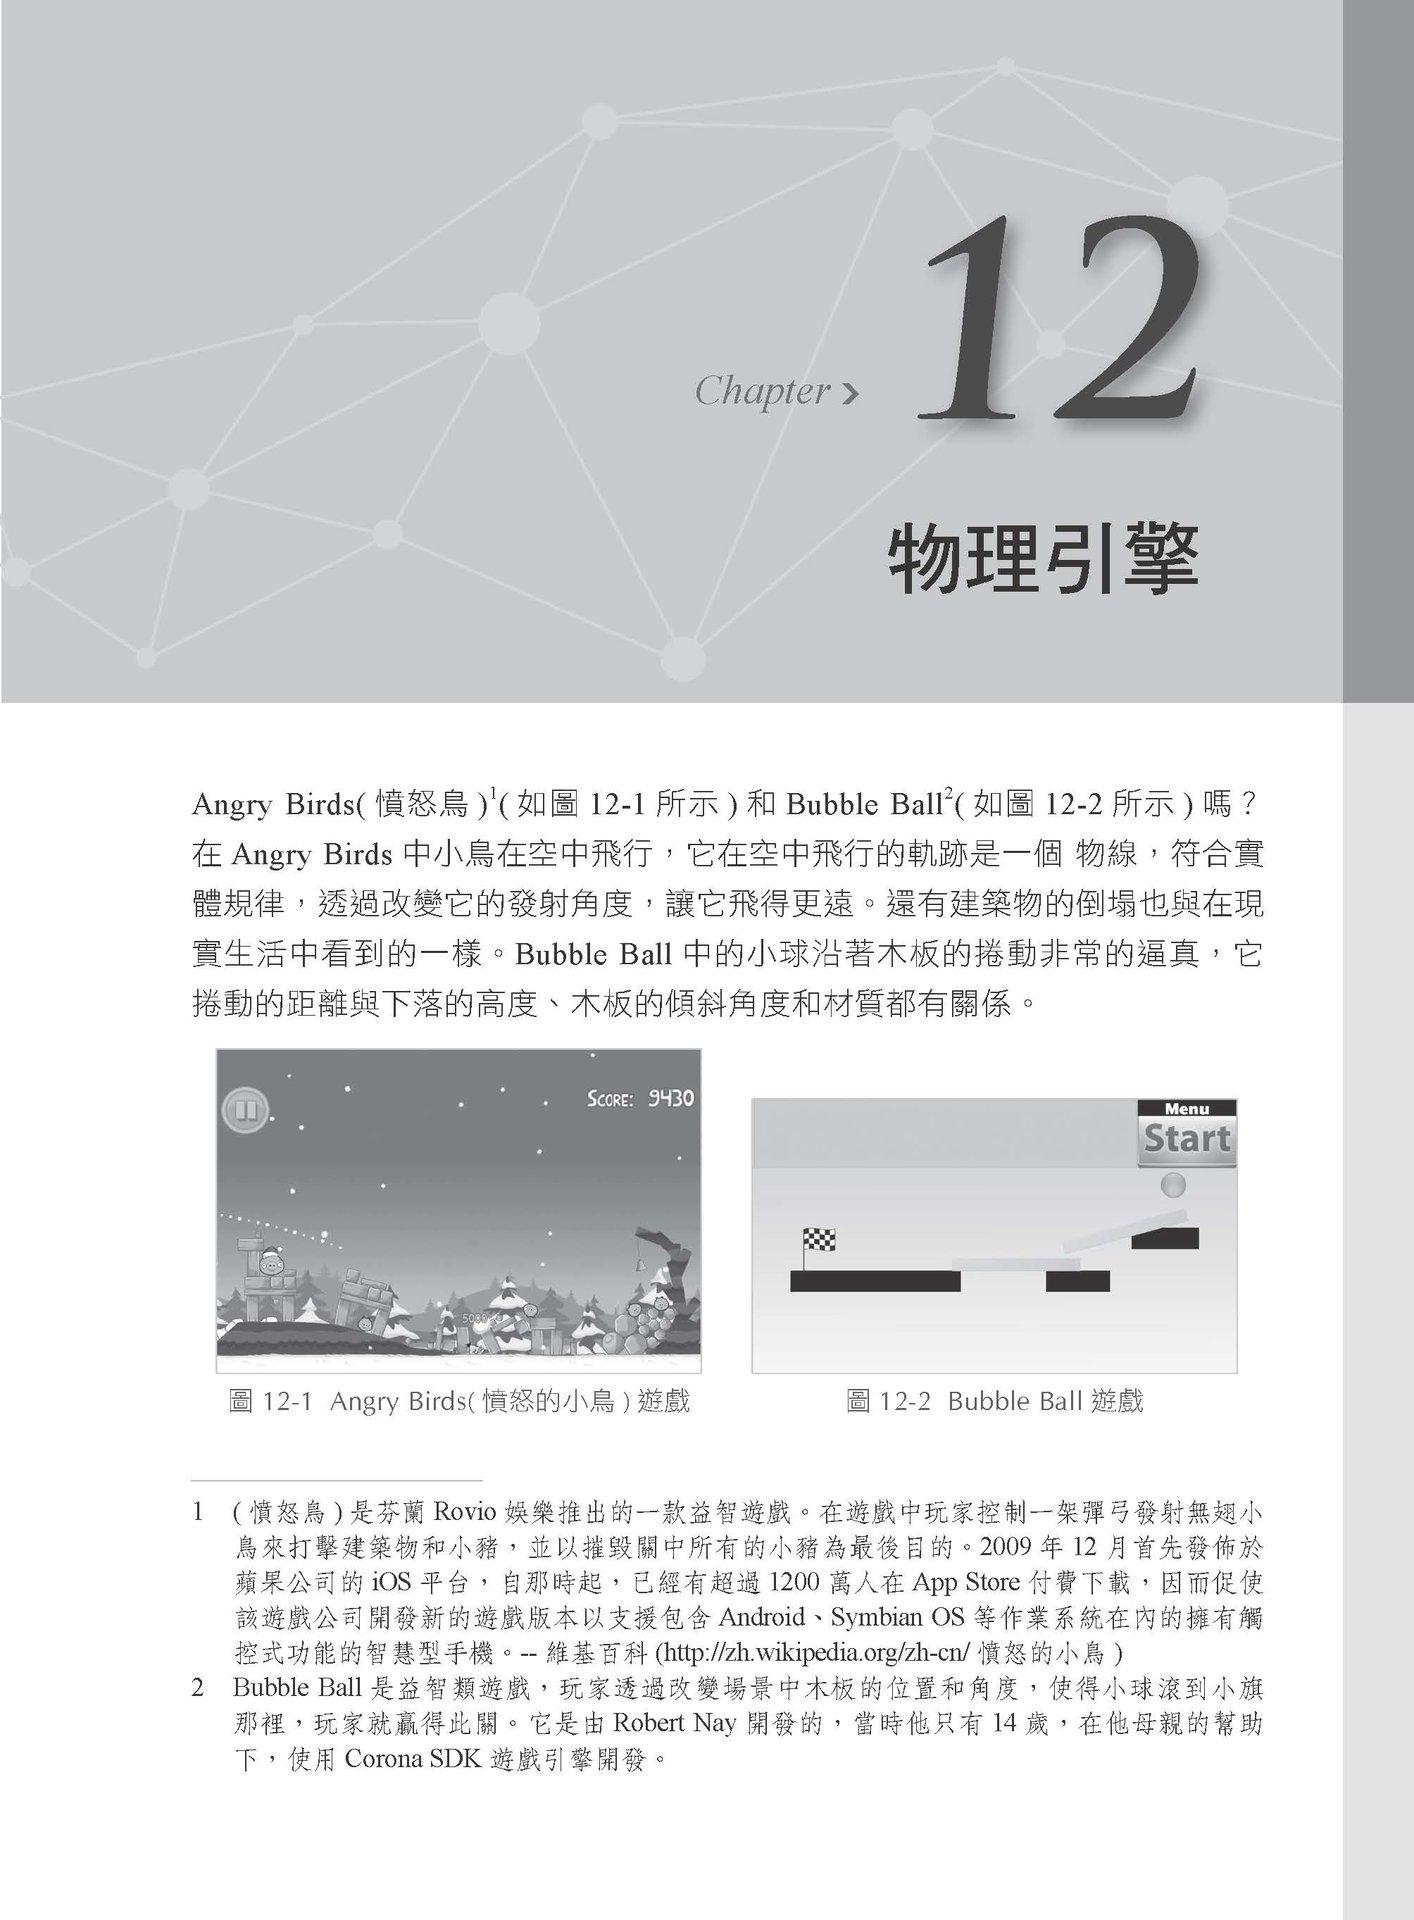 FB官方推薦跨平台遊戲引擎:Cocos2d-x 實際演練之JS篇-preview-10